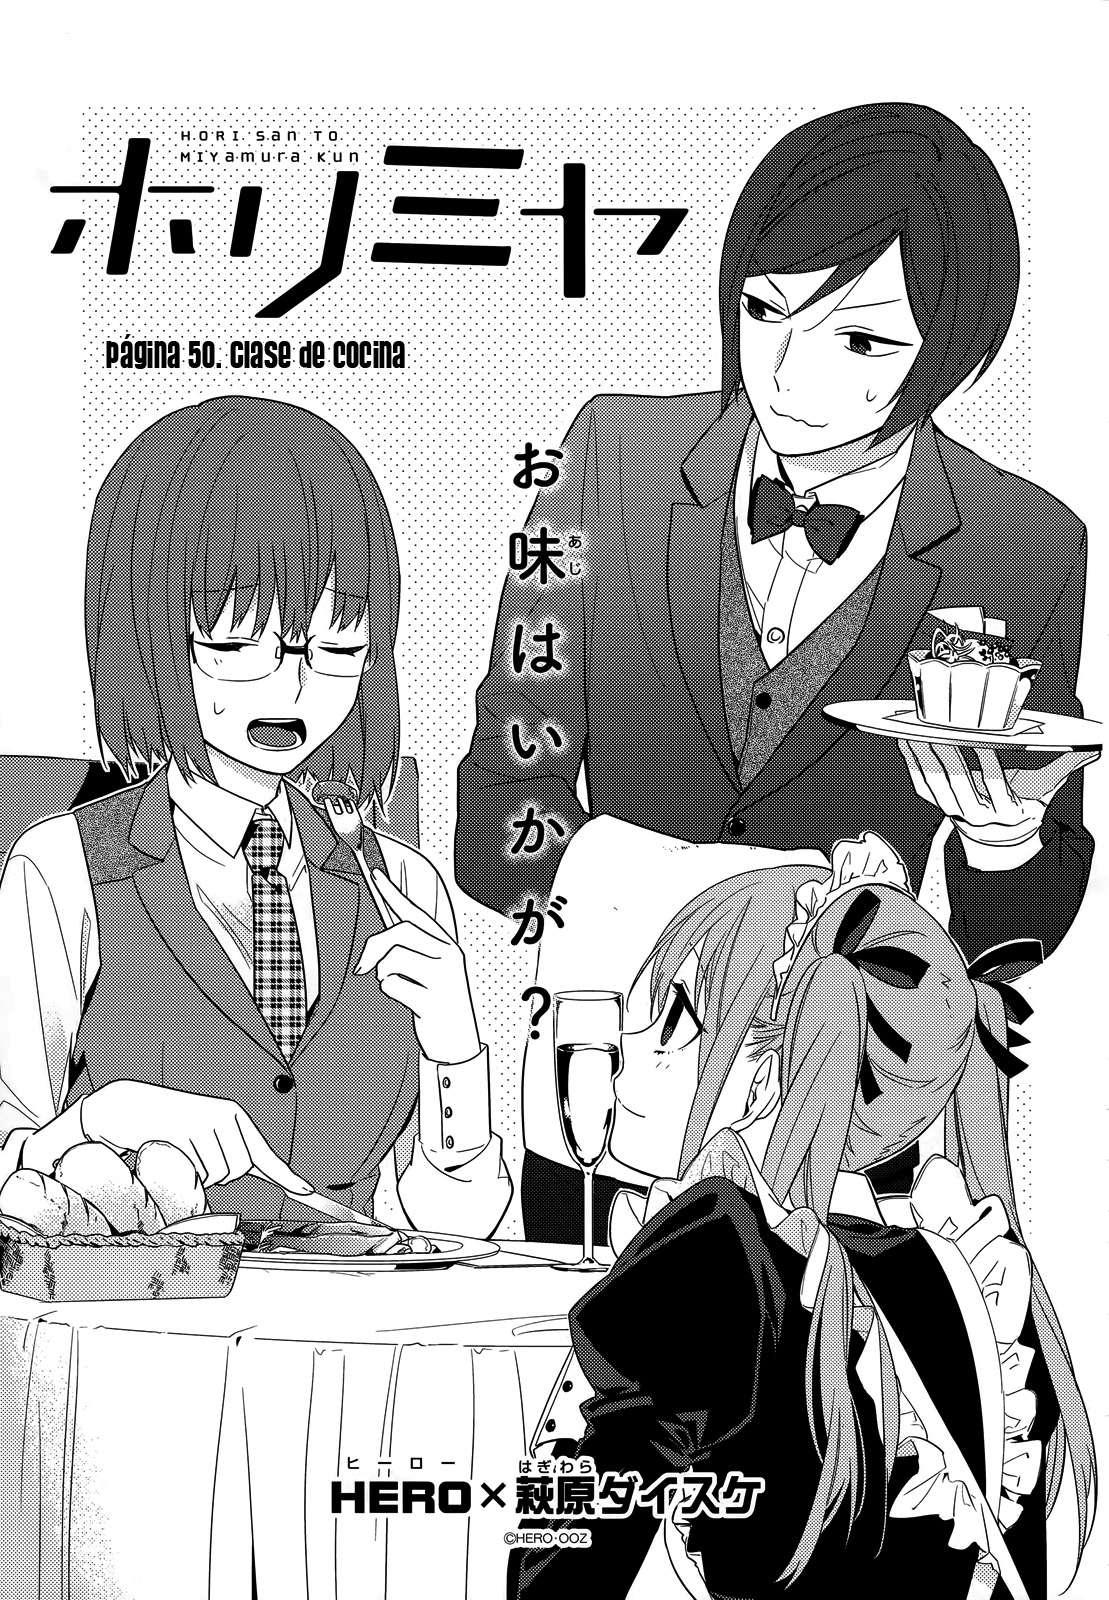 http://c5.ninemanga.com/es_manga/19/1043/364697/39349a7c3ed00bda5647ff55406aa4d2.jpg Page 3